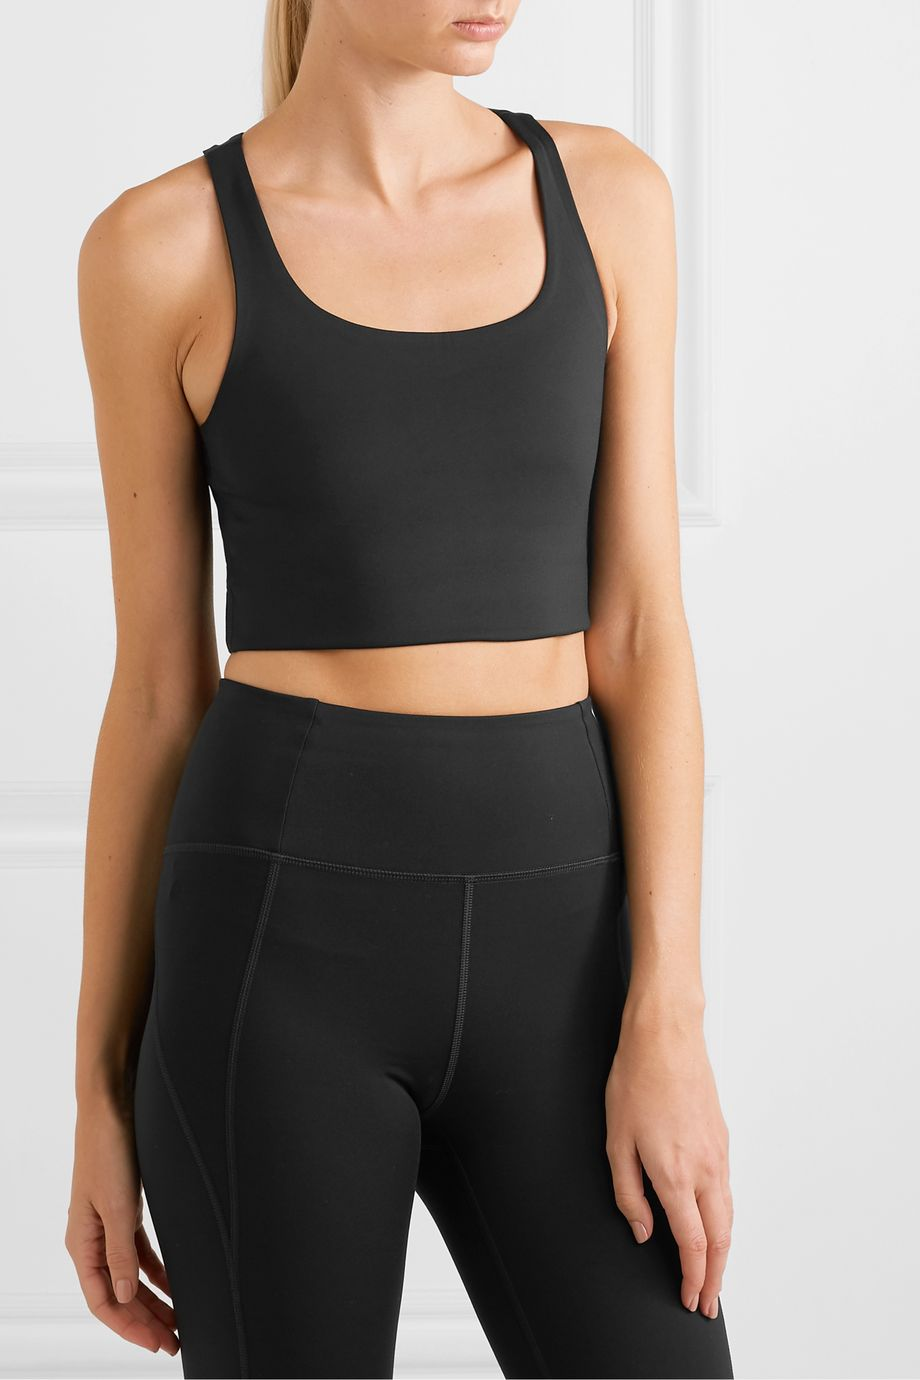 Girlfriend Collective Paloma stretch sports bra